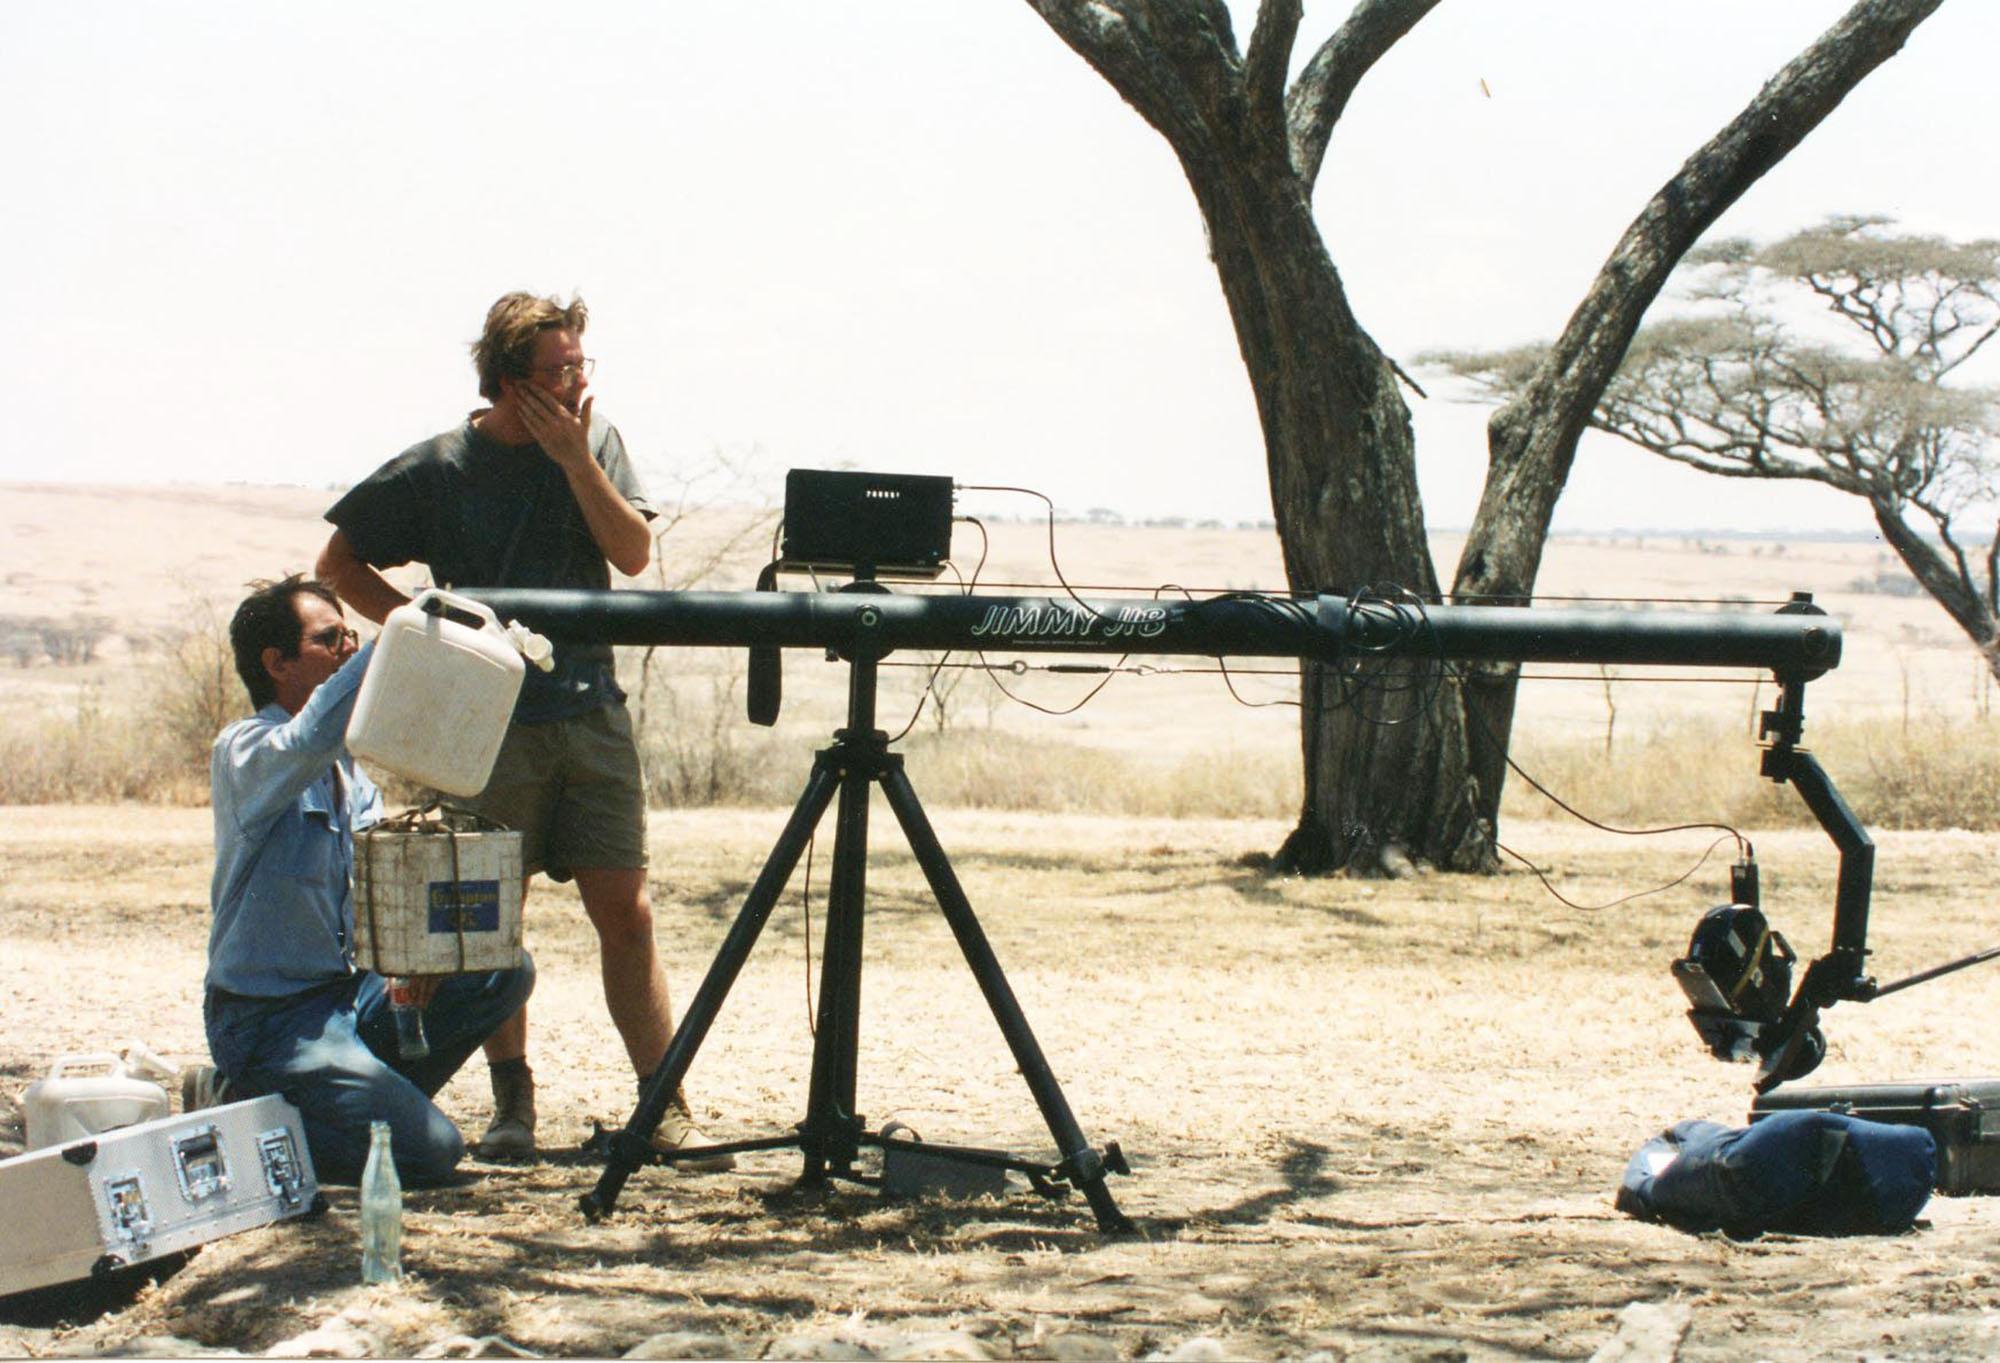 Producer 'AFRICAS PARADISE OF THORNS' NGTV 1996 - A 50' film about the wildlife of Tanzania's acacia woodlands.Executive producer : Hugo van Lawick